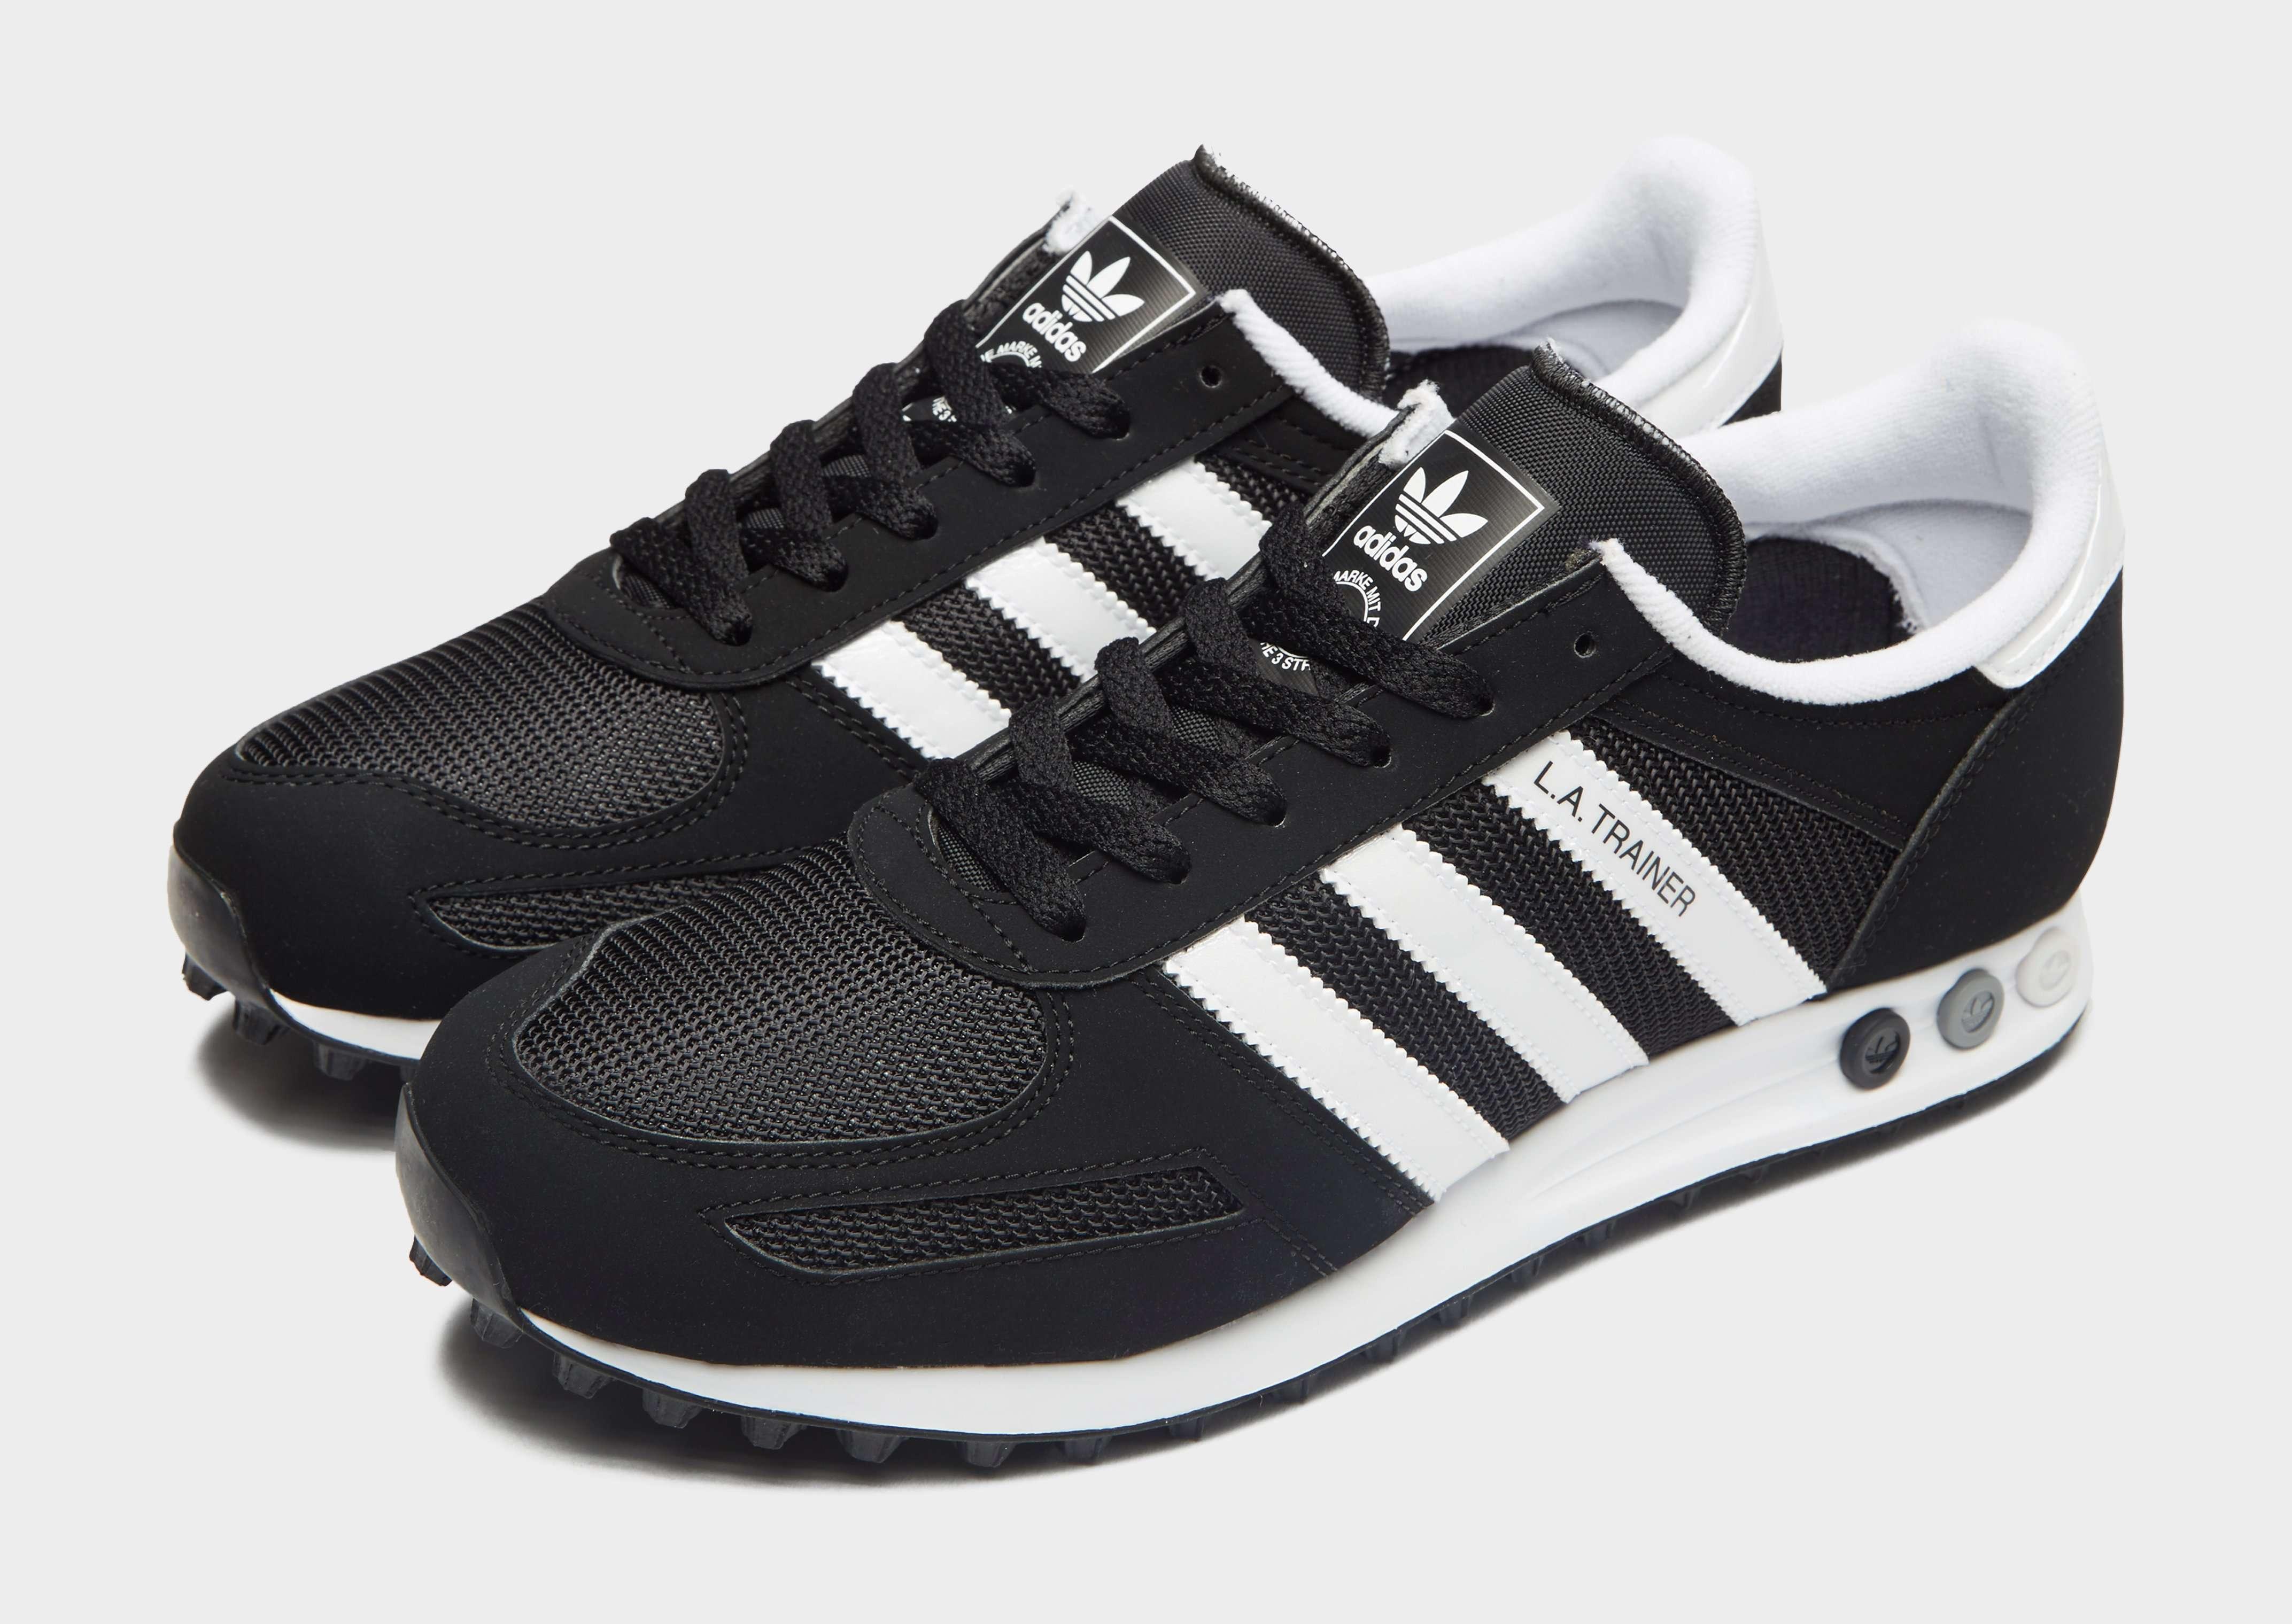 Adidas Originals La Trainer Og Jd Sports